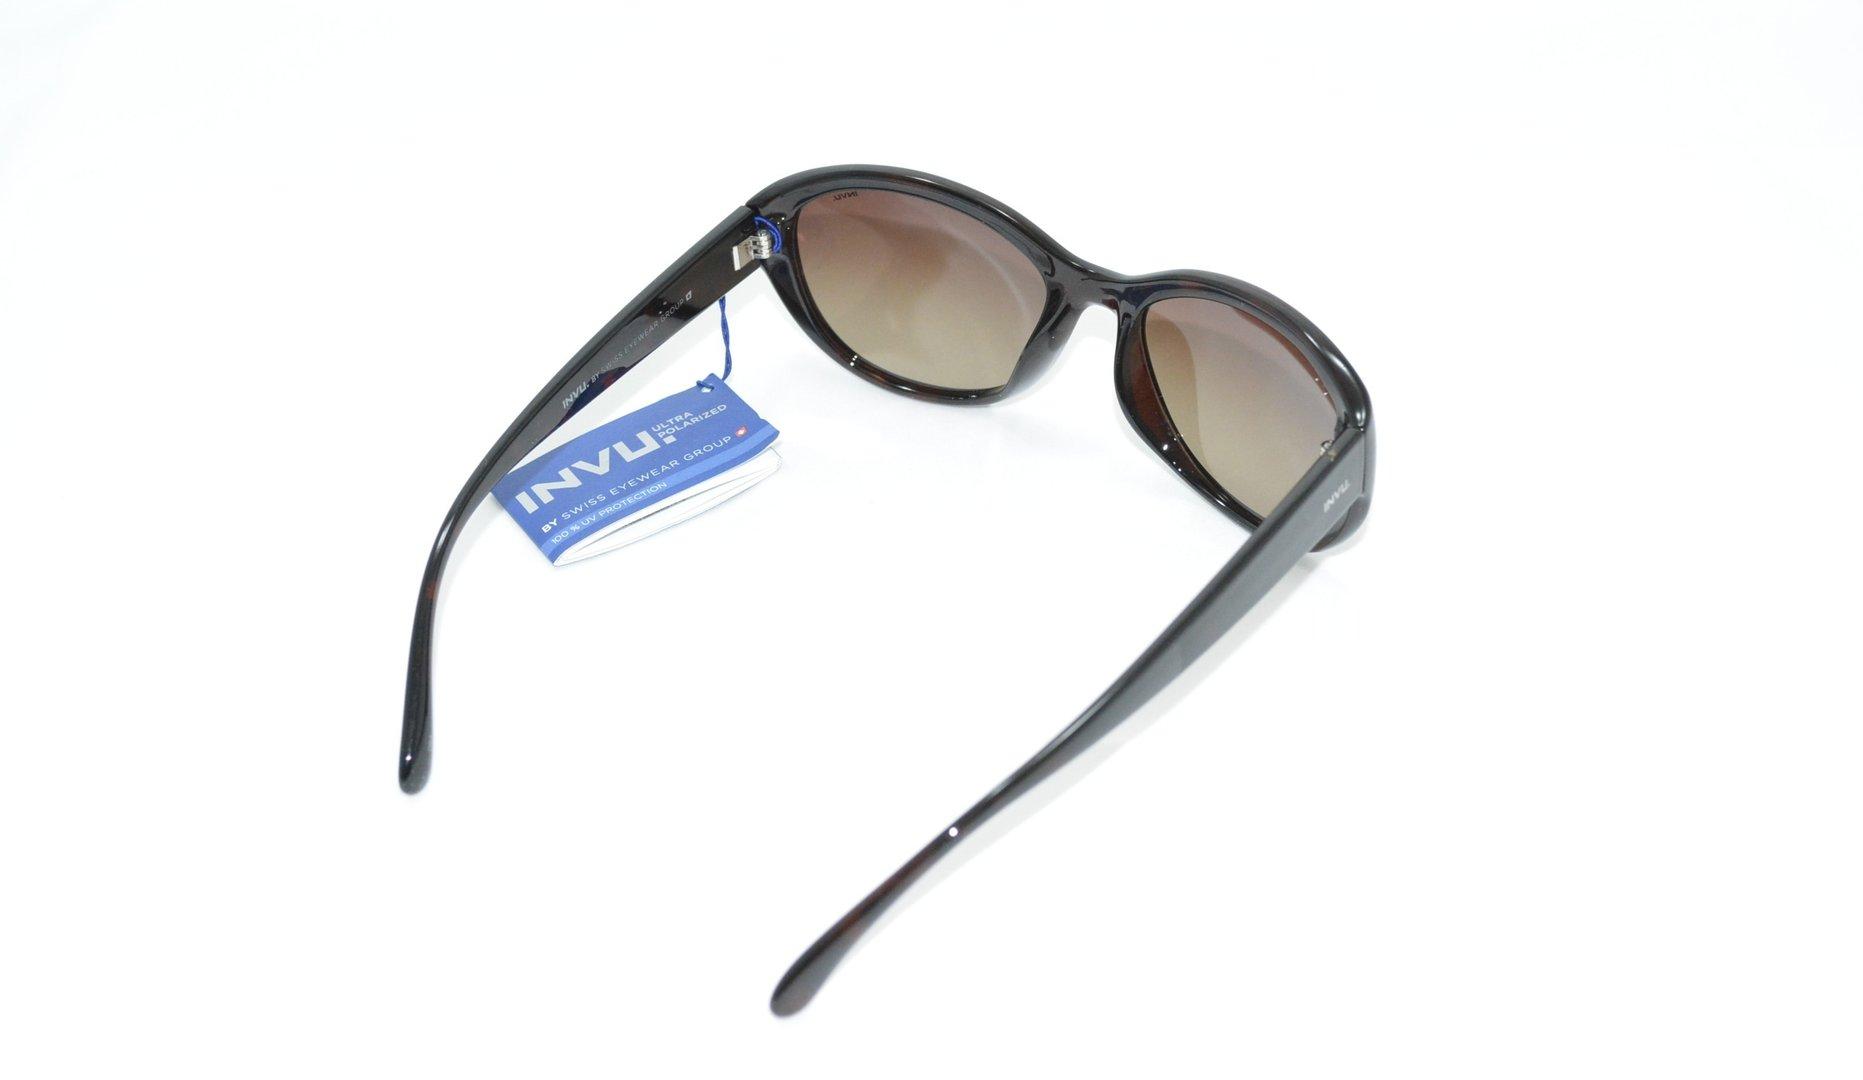 9d275680bf7 Swiss Eyewear Group Italia Srl - eyewear near me